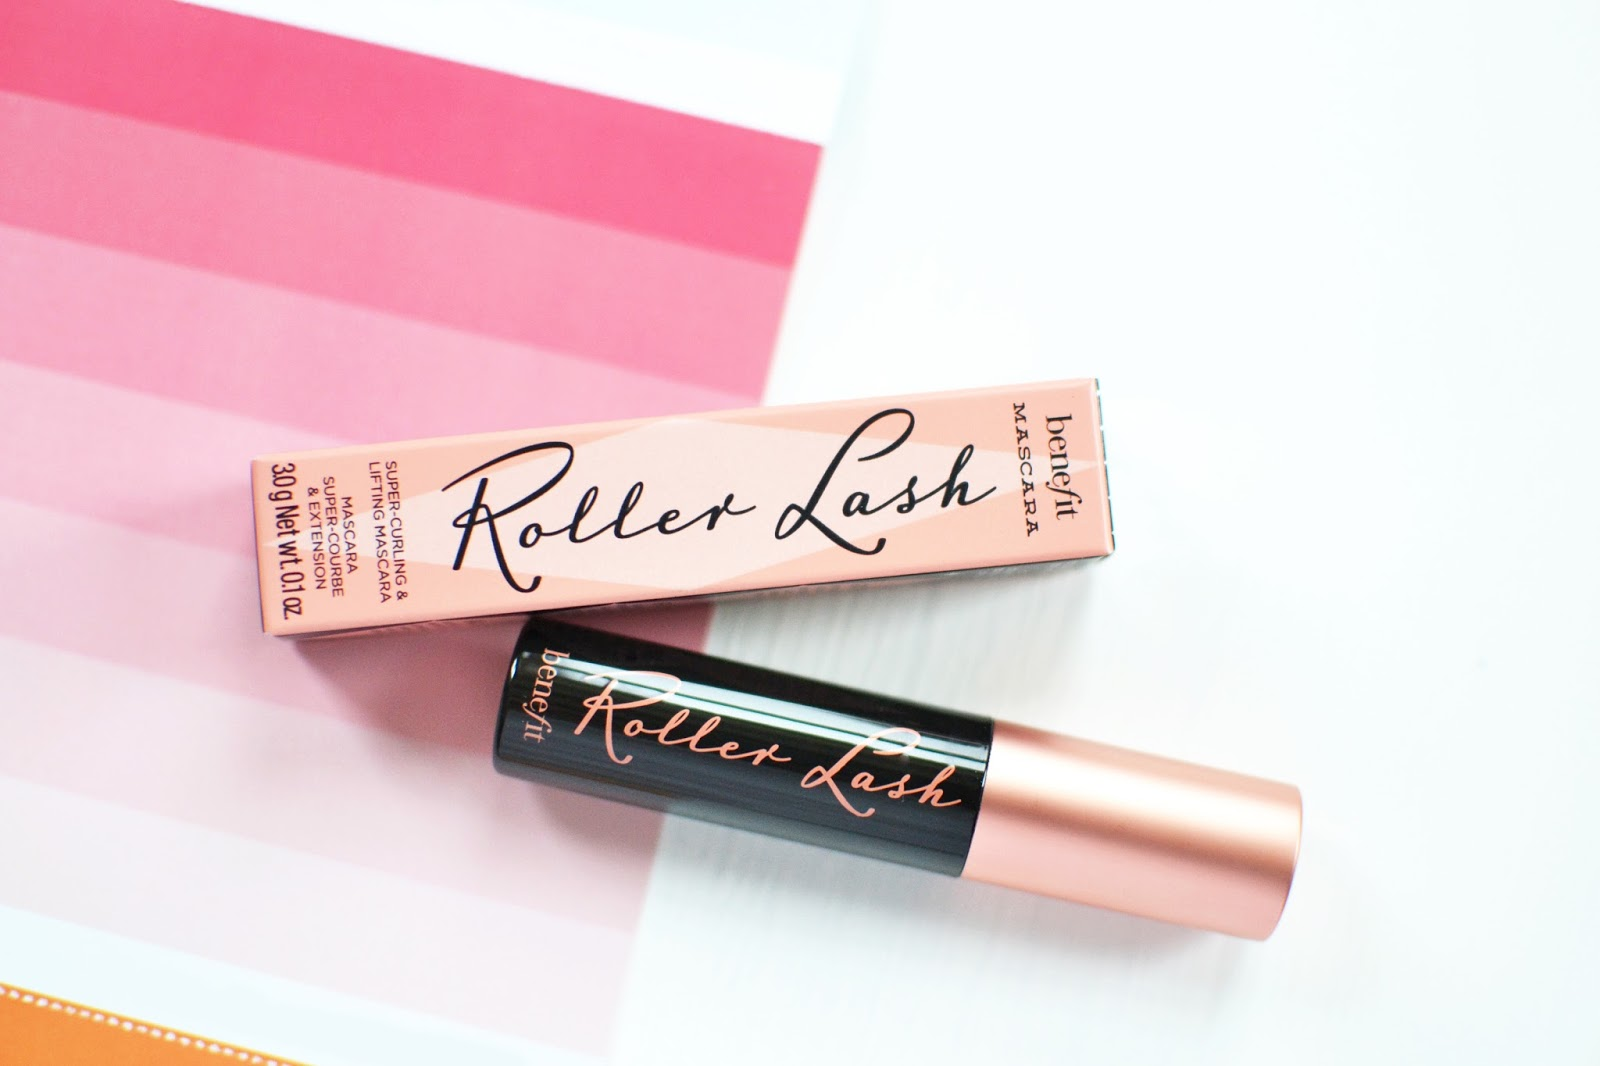 benefit roller lash, benefit cosmetics roller lash